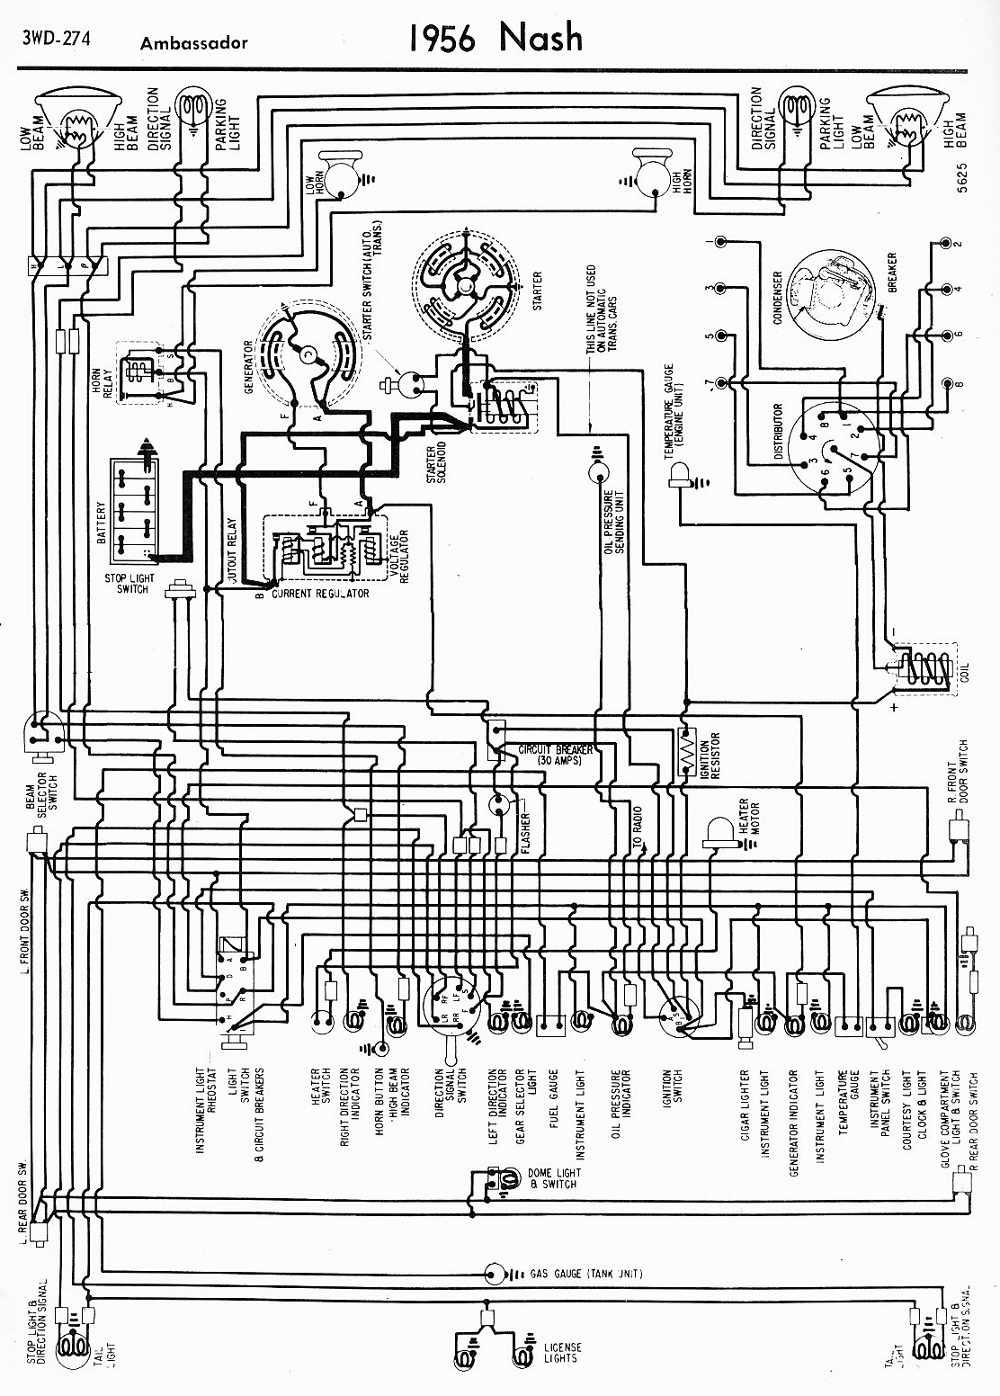 Porsche 928 Instrument Cluster Schematics Electrical Wiring Diagram 1964 Dodge Dart 1966 Ignition Schematic Diagrams Cargo Cover Charger